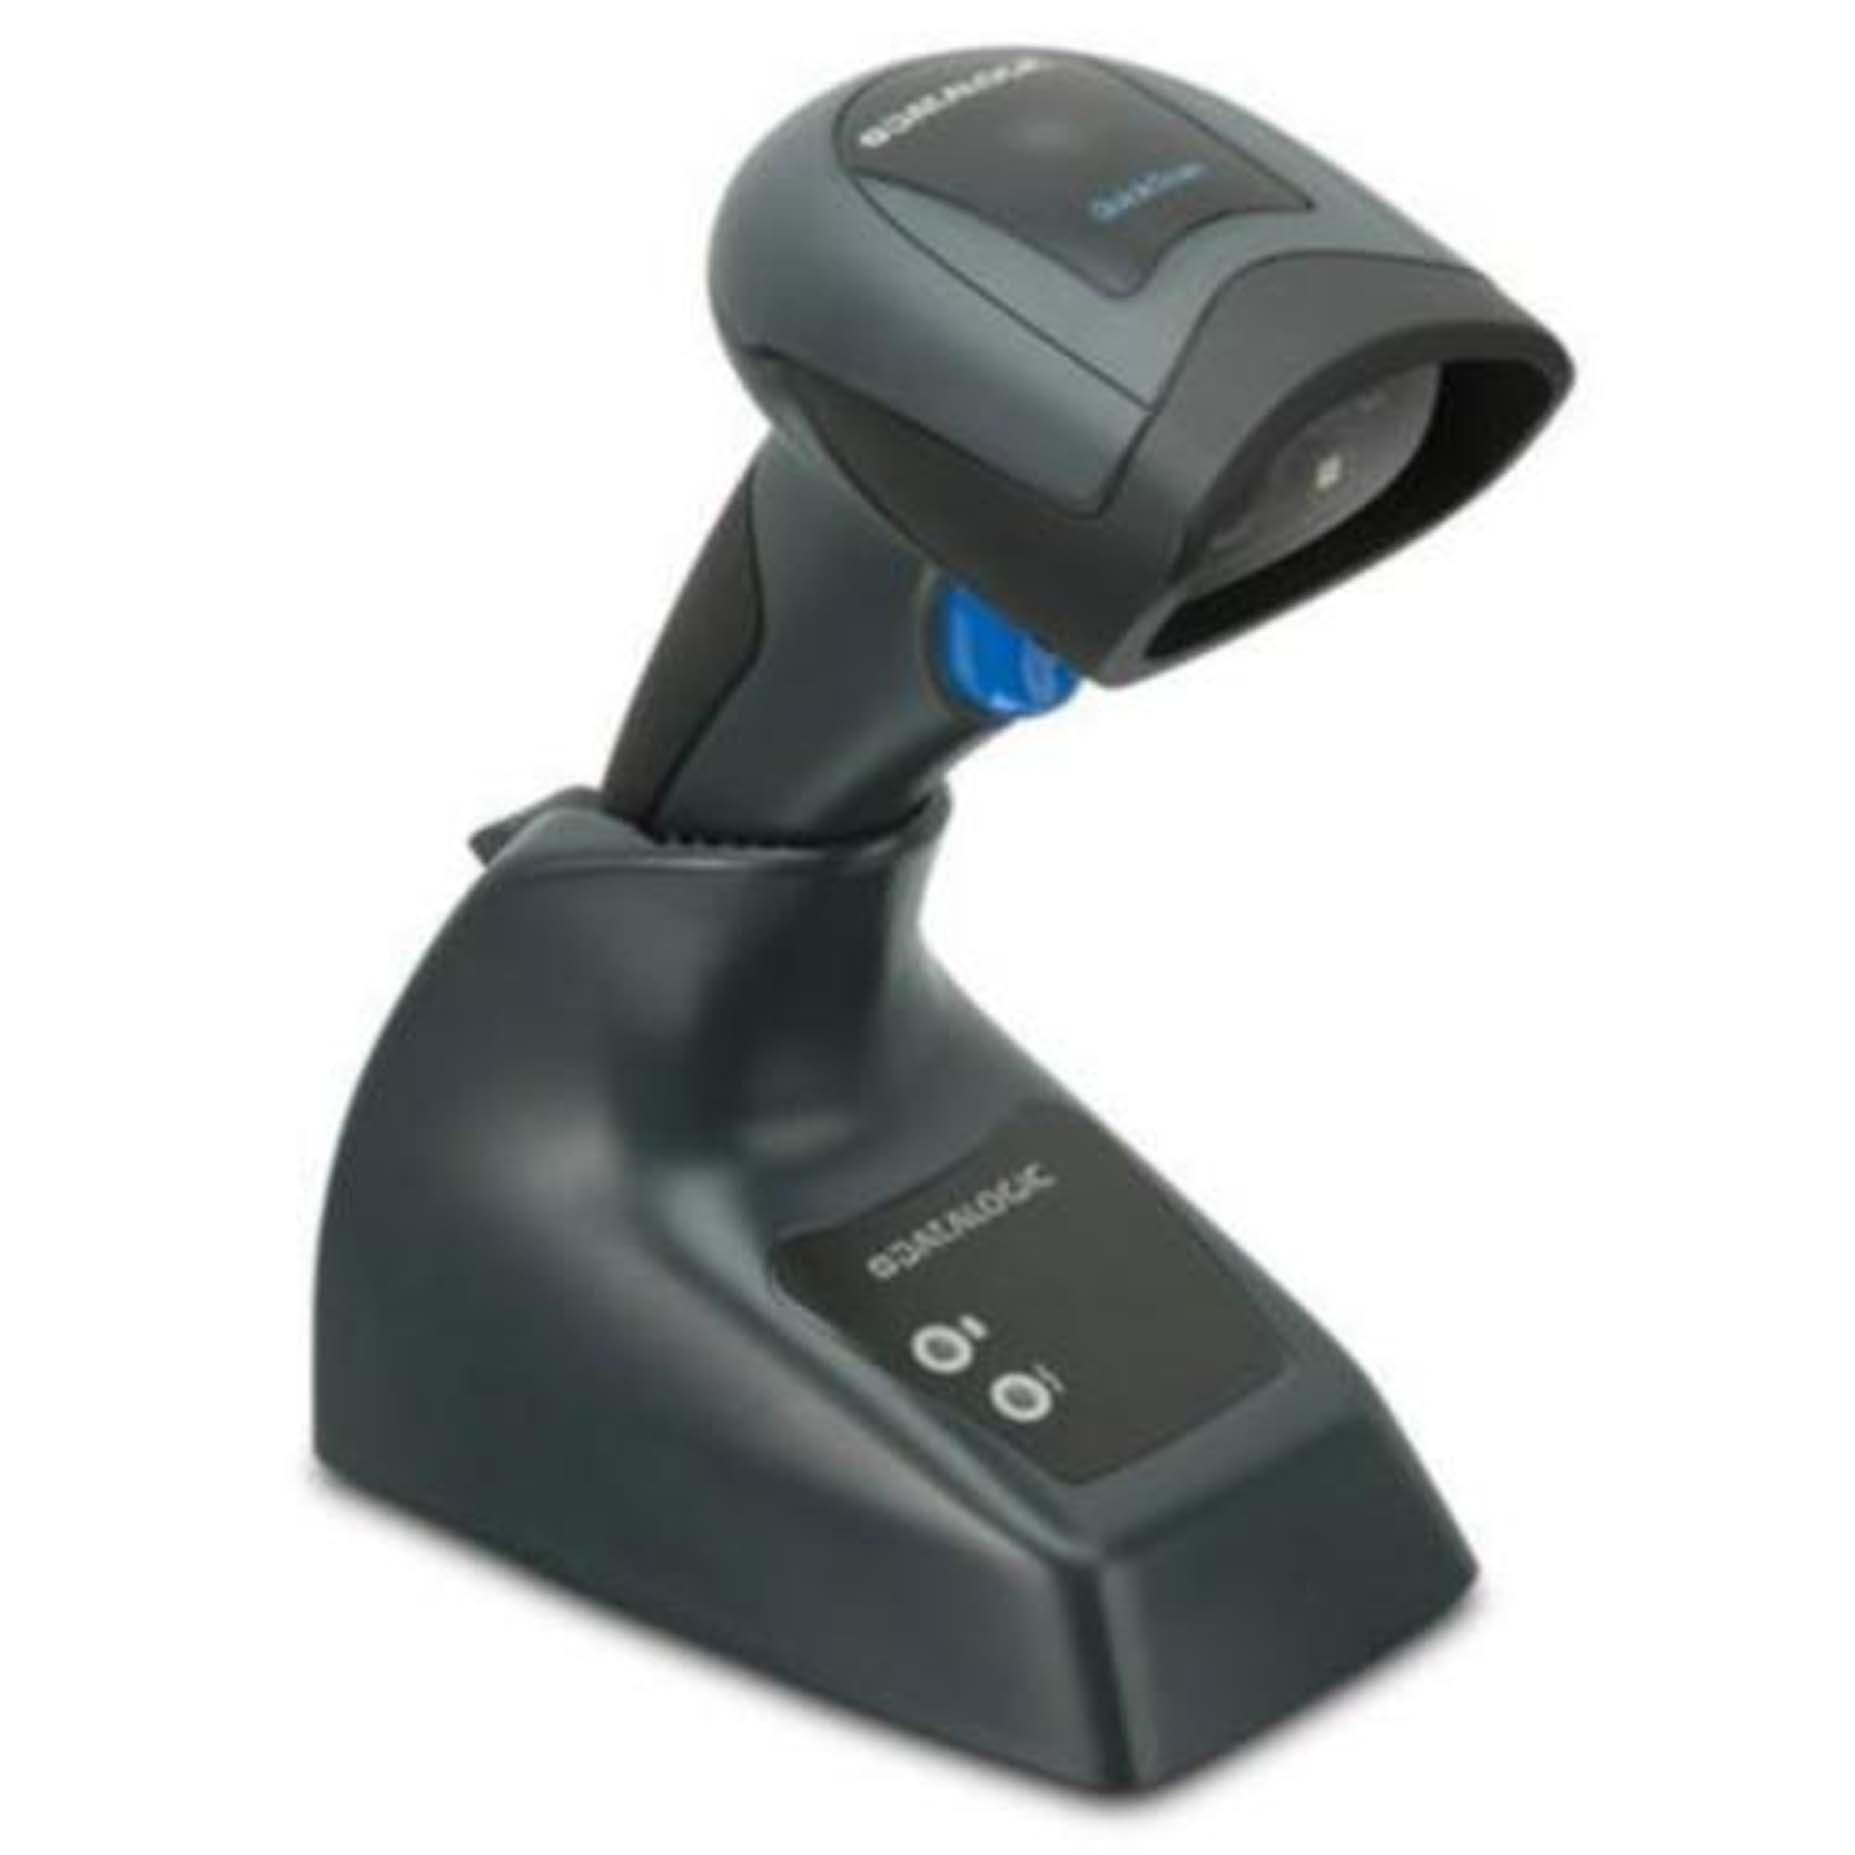 Harga Datalogic QM2430 Quickscan 2D Imager Barcode Scanner USB